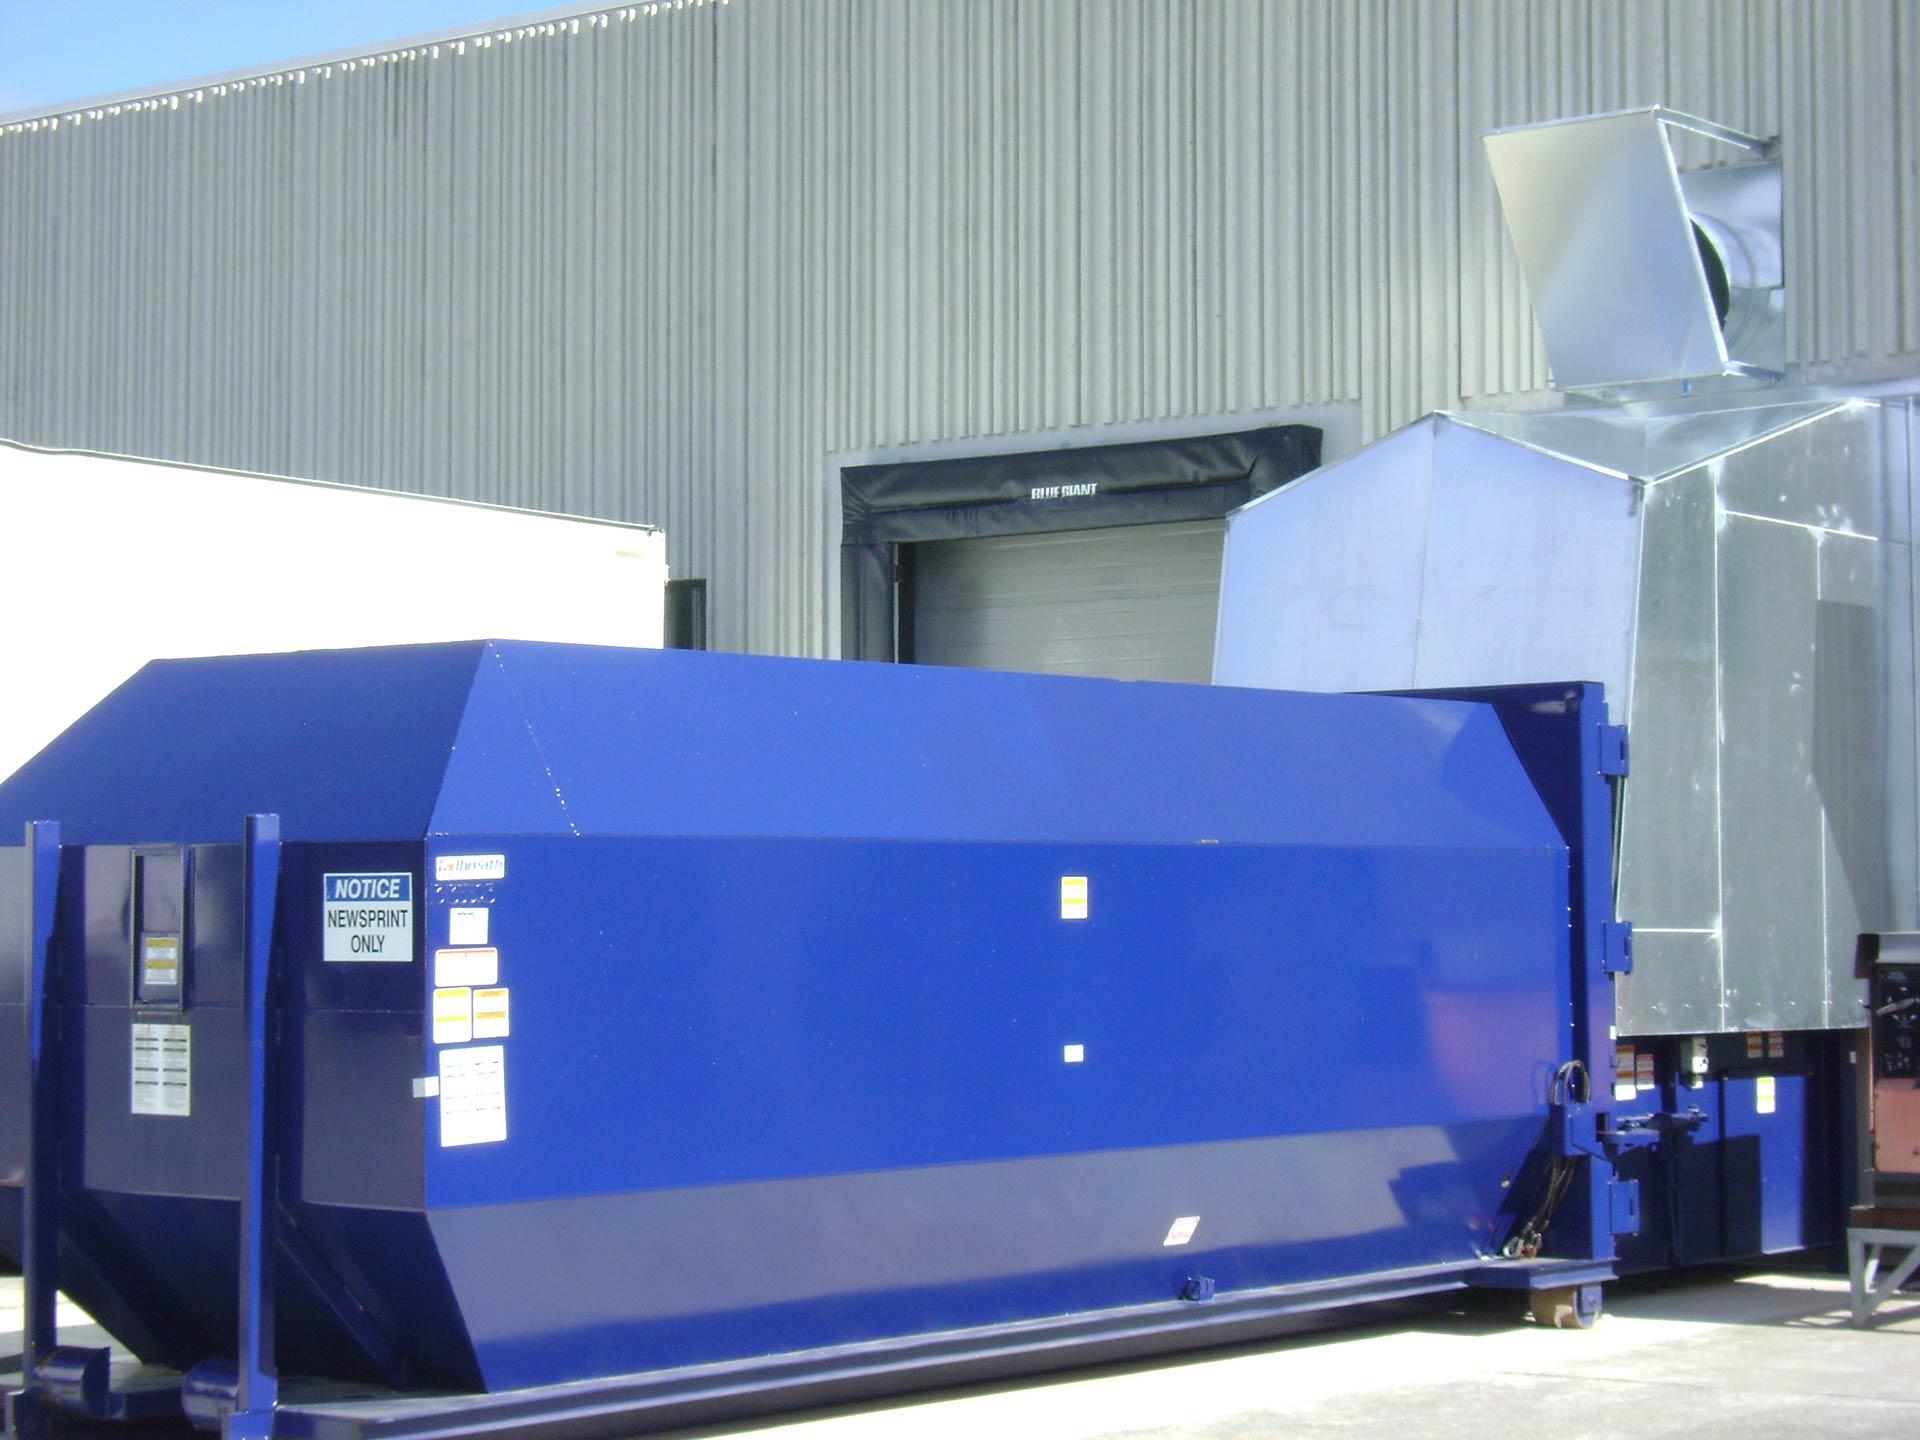 Kernic compactor